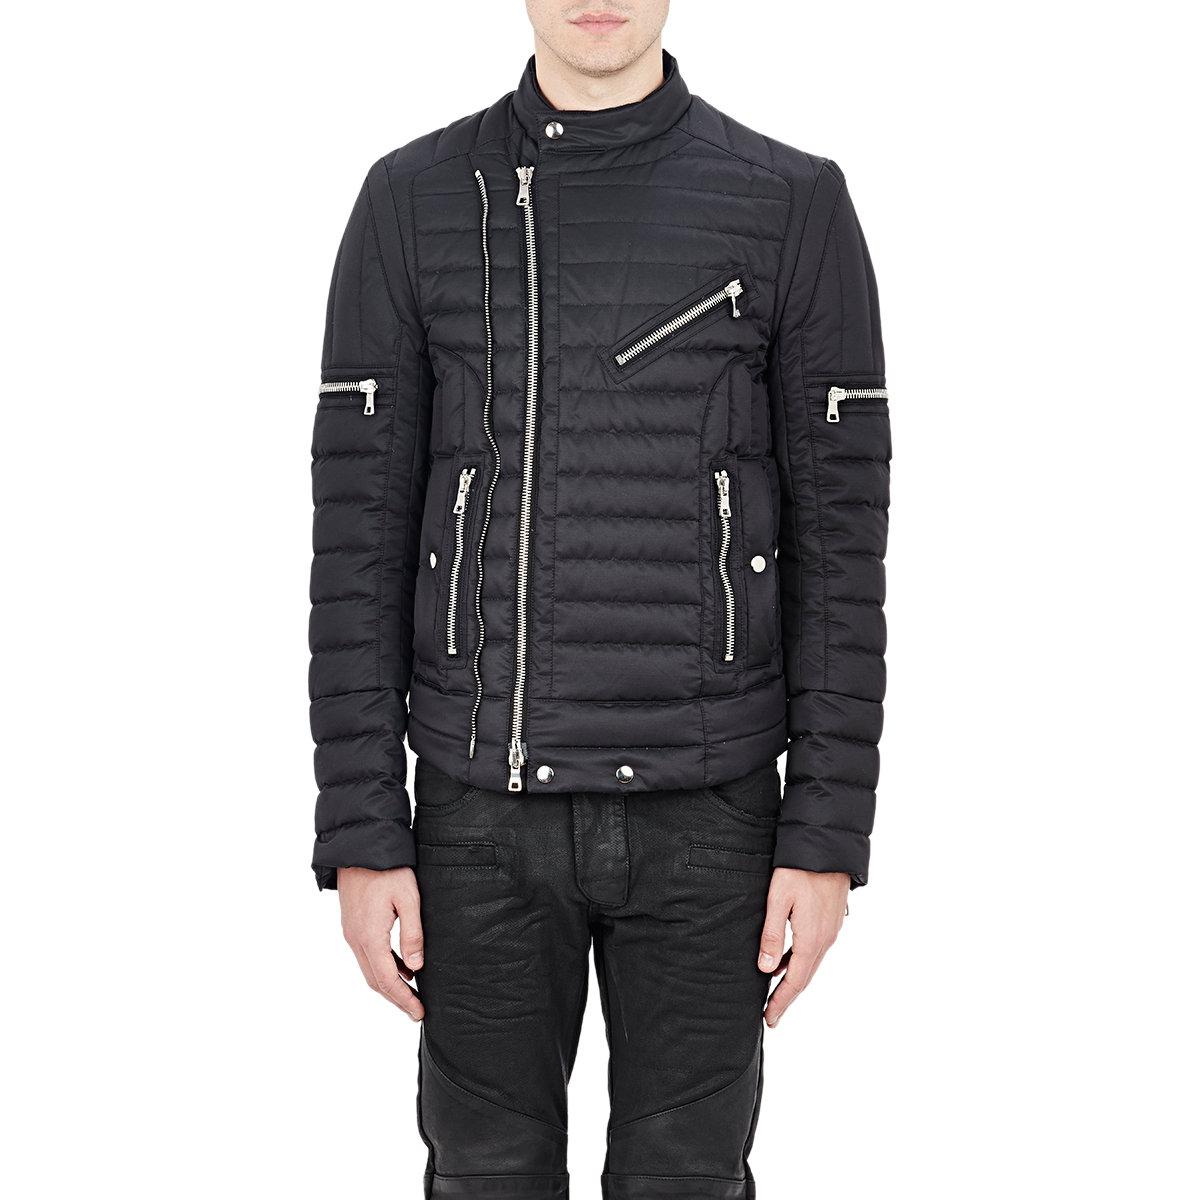 Balmain Multi Zip Moto Puffer Jacket In Black For Men Lyst